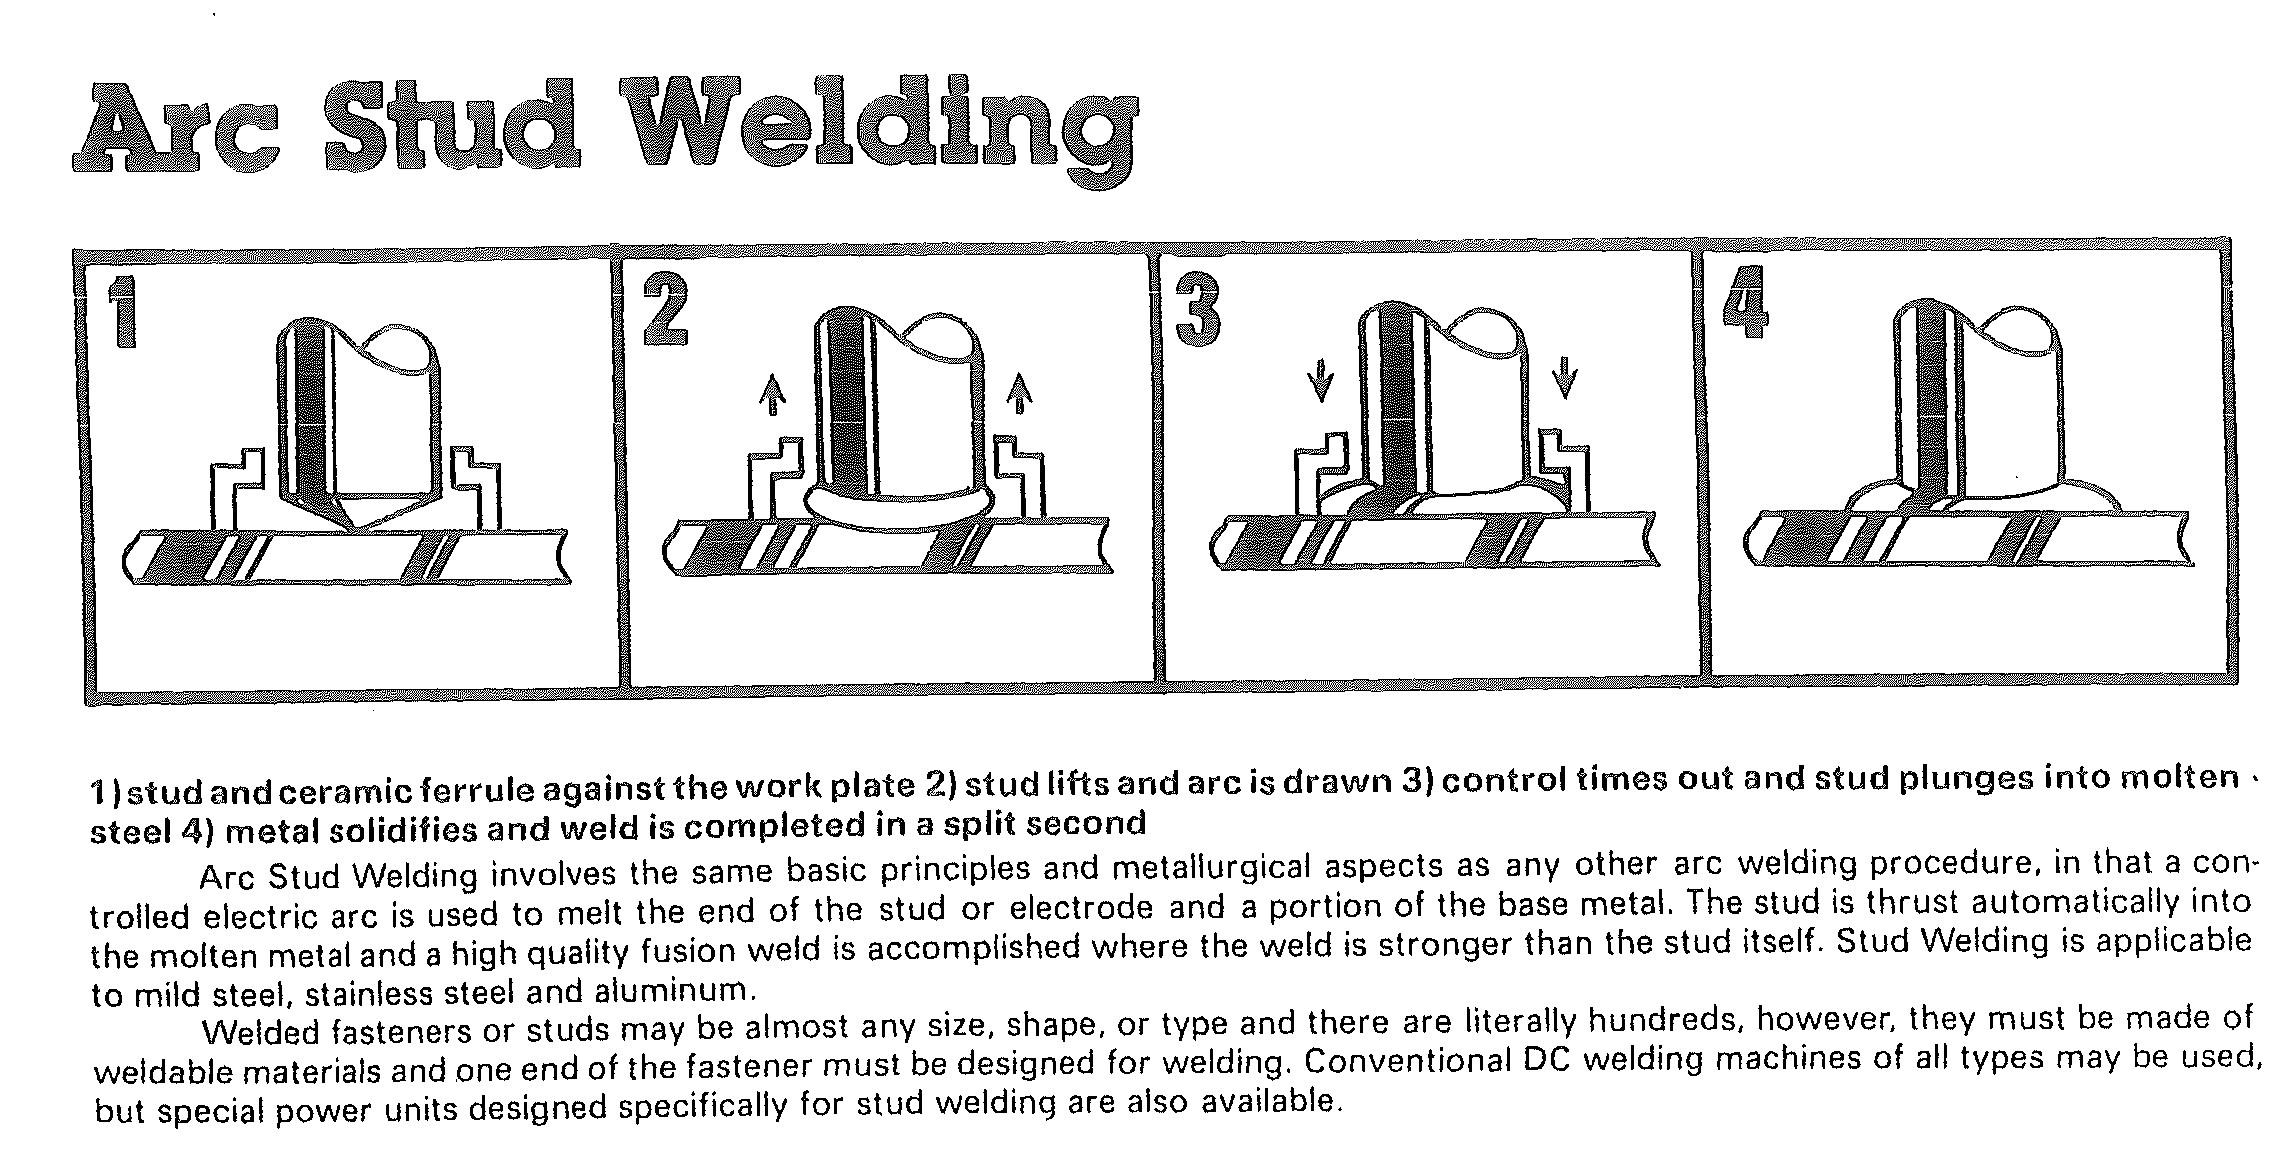 drawn-arc-stud-welding